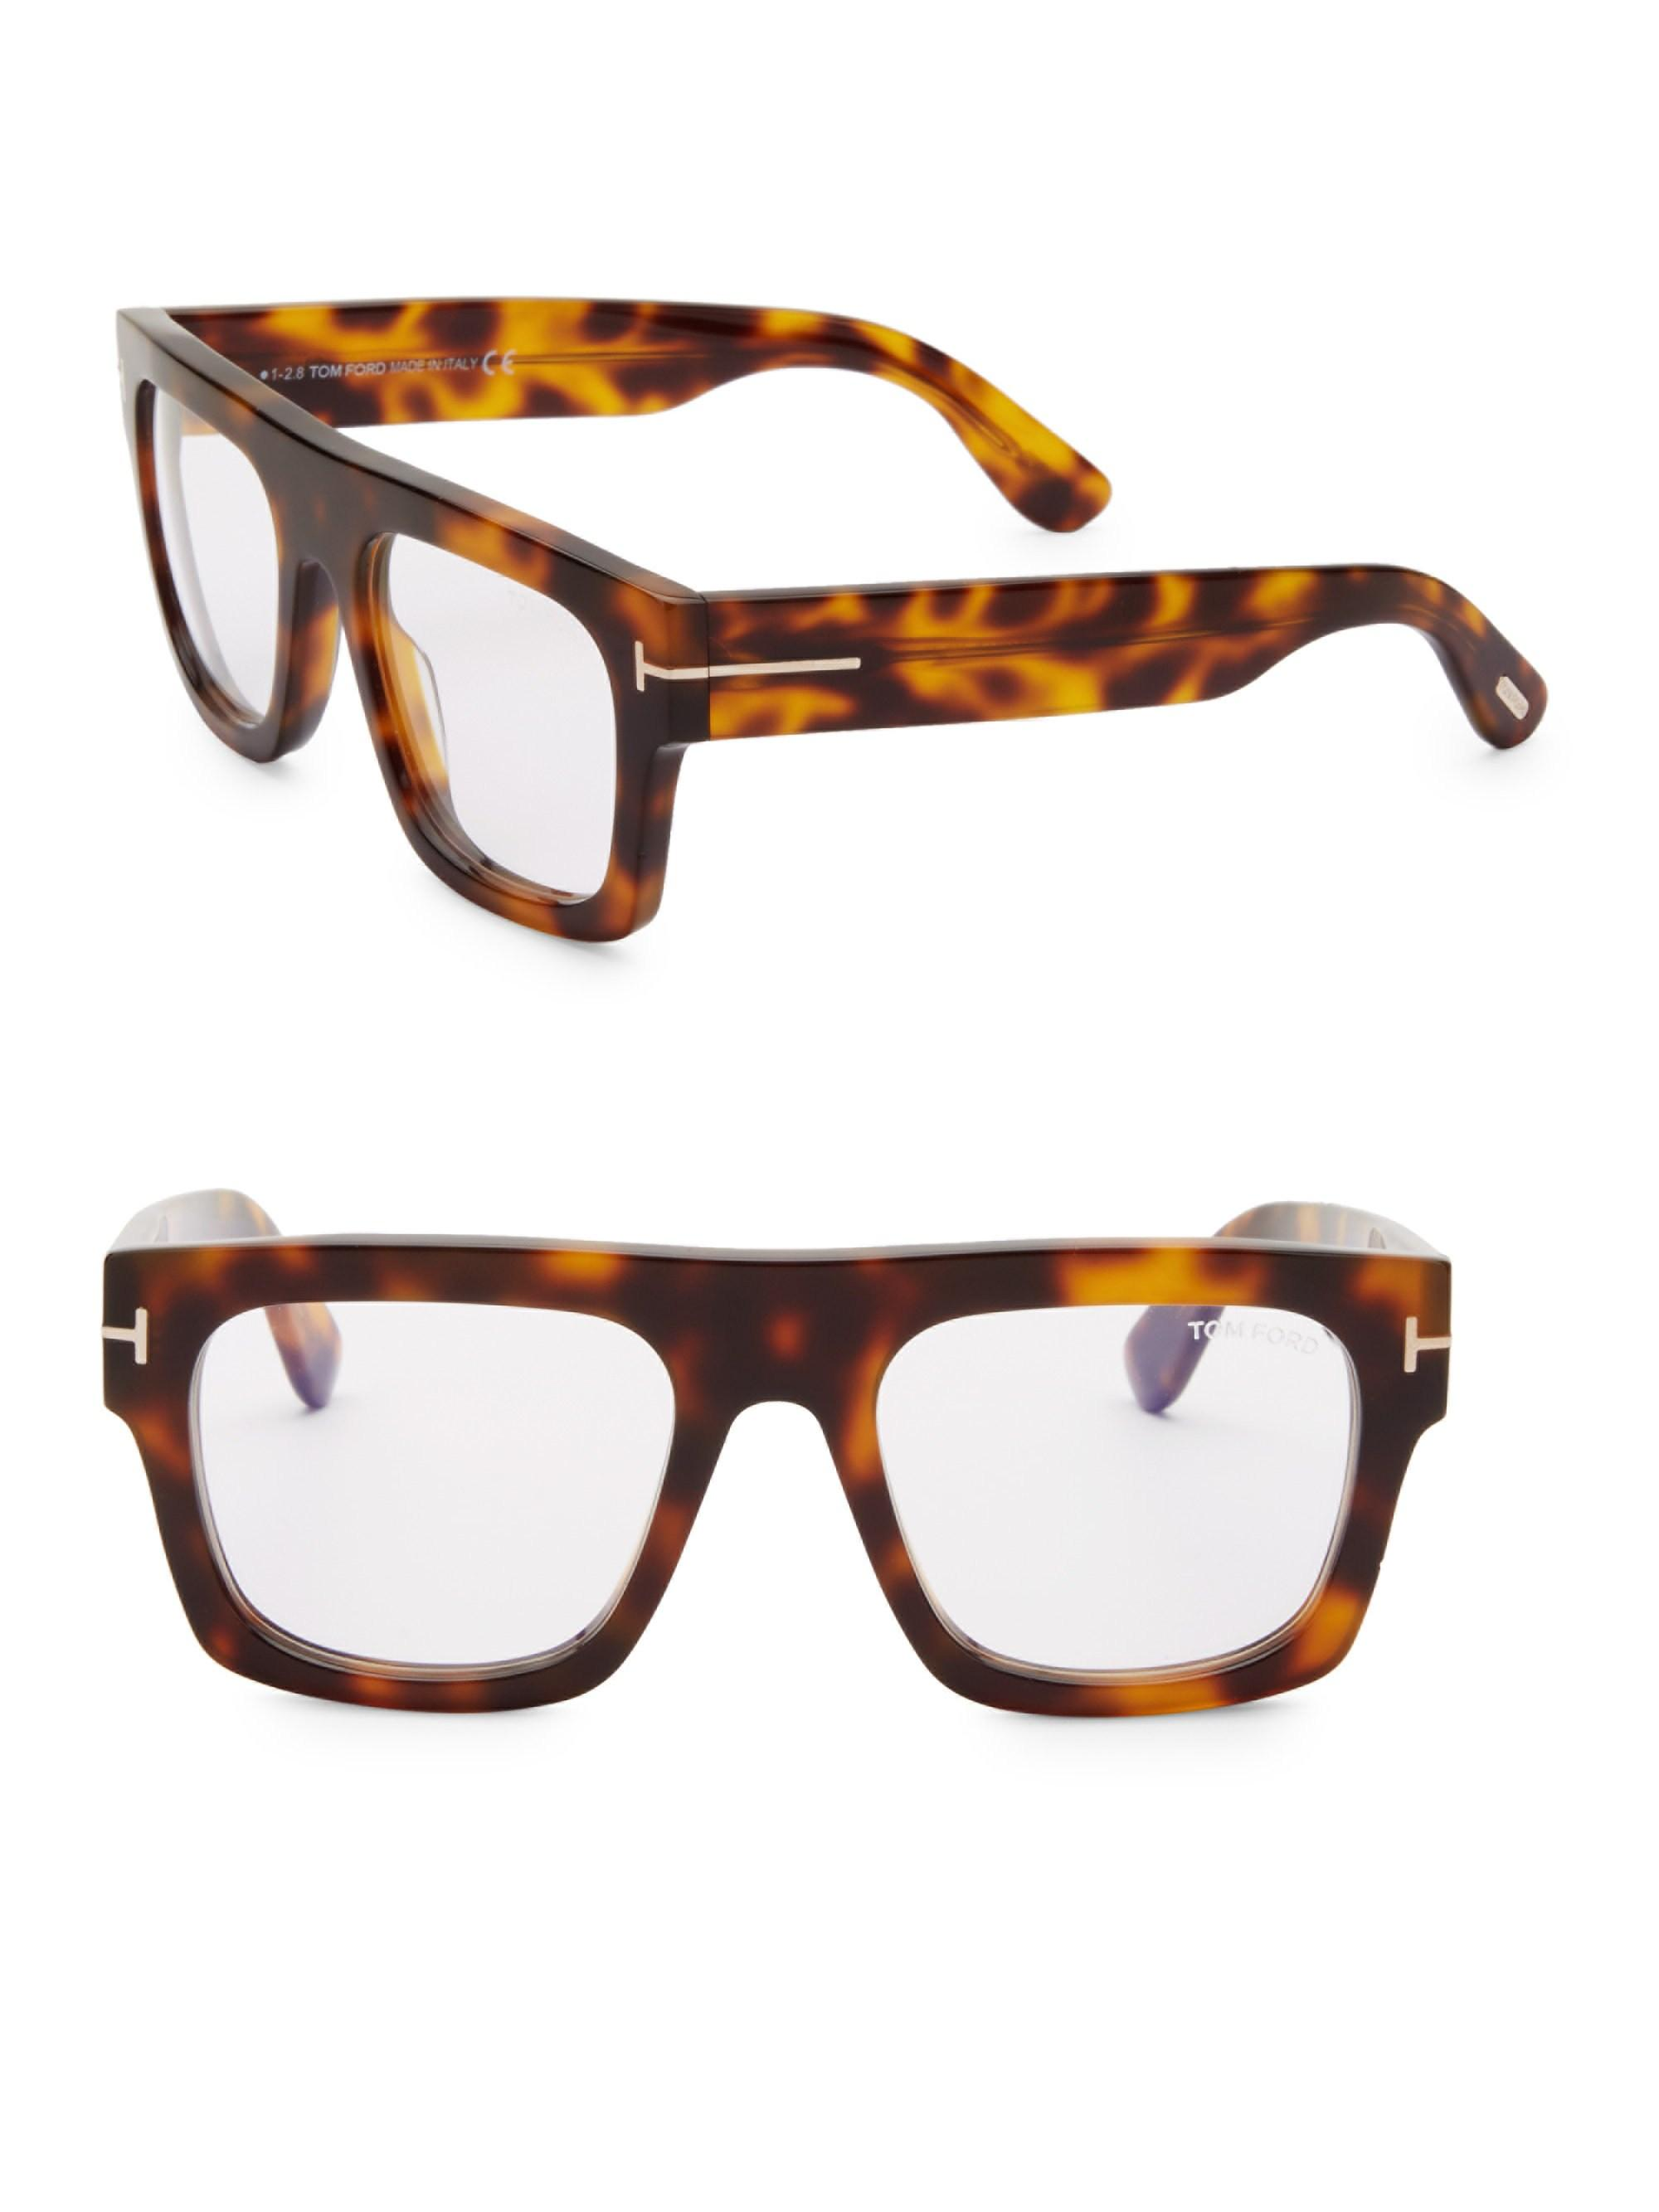 5737f63d31 Tom Ford Men s Blue Block 53mm Square Optical Glasses - Havana in ...